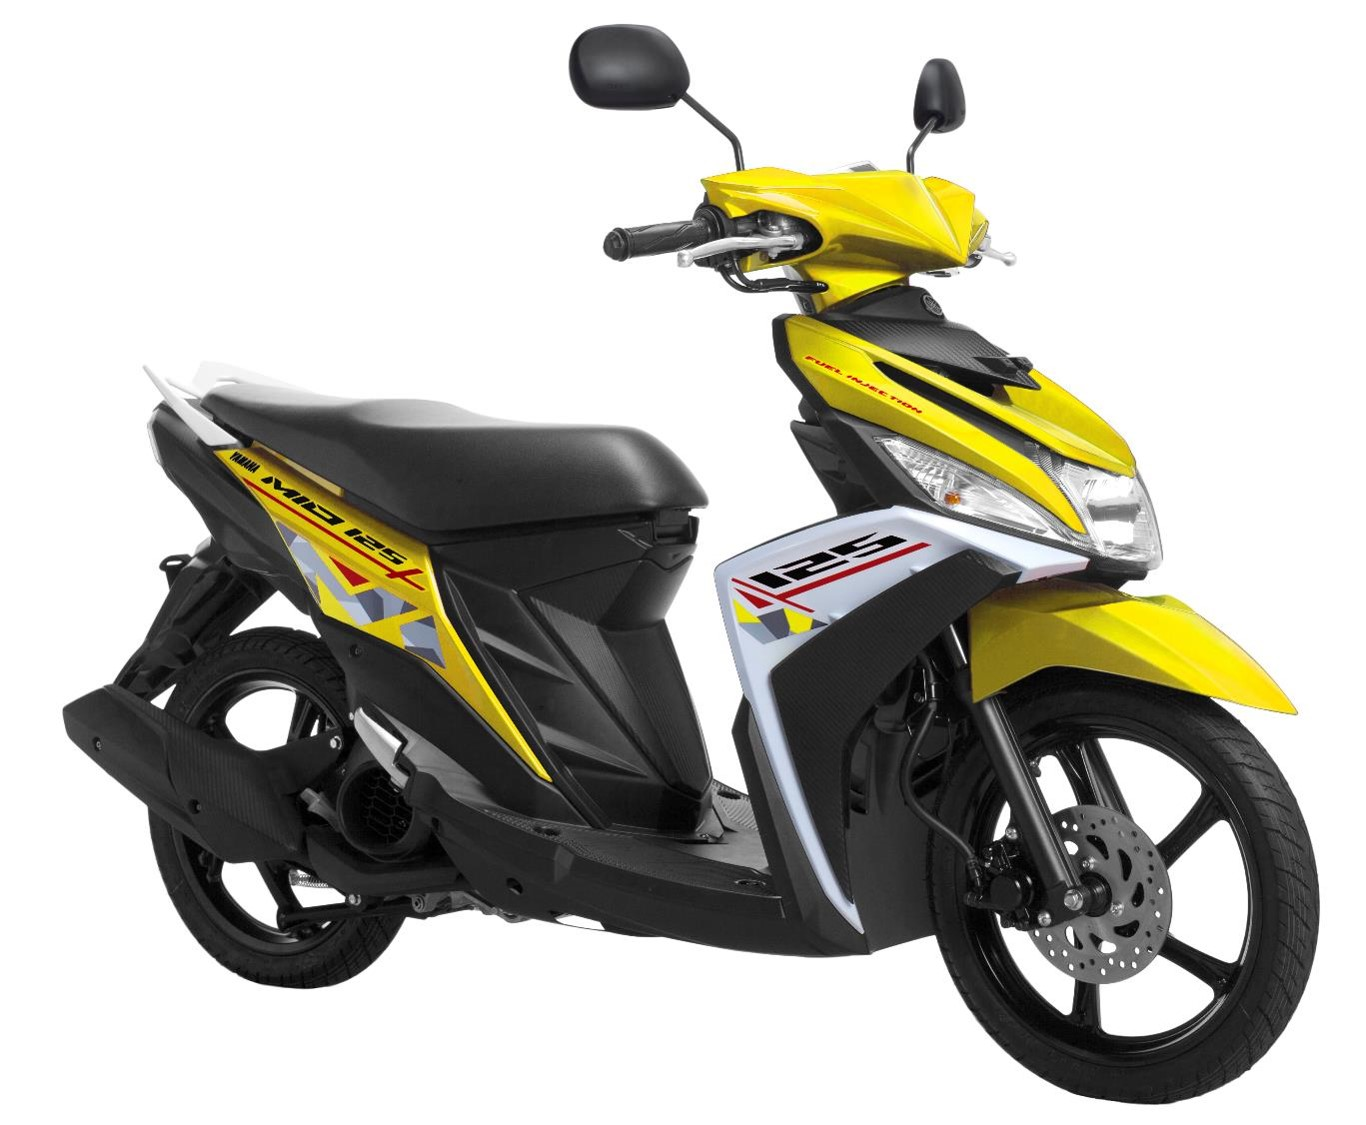 Mio m3 aspiring yellow